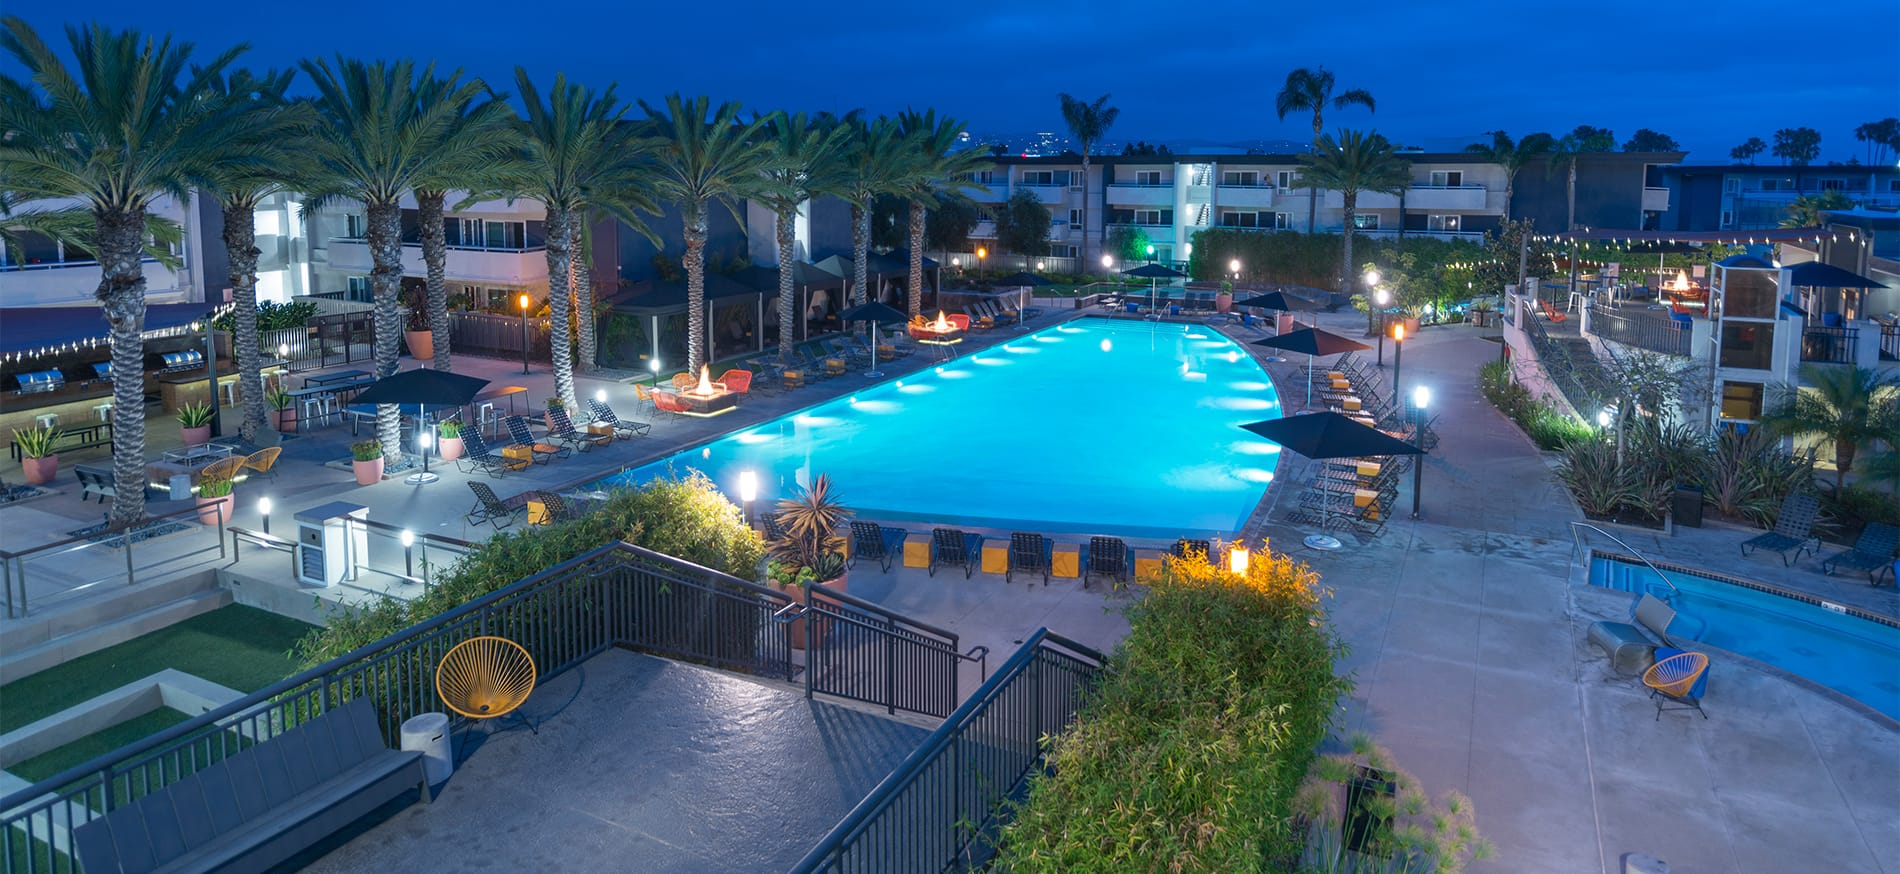 Eight 80 Newport Beach Apartments in Newport Beach